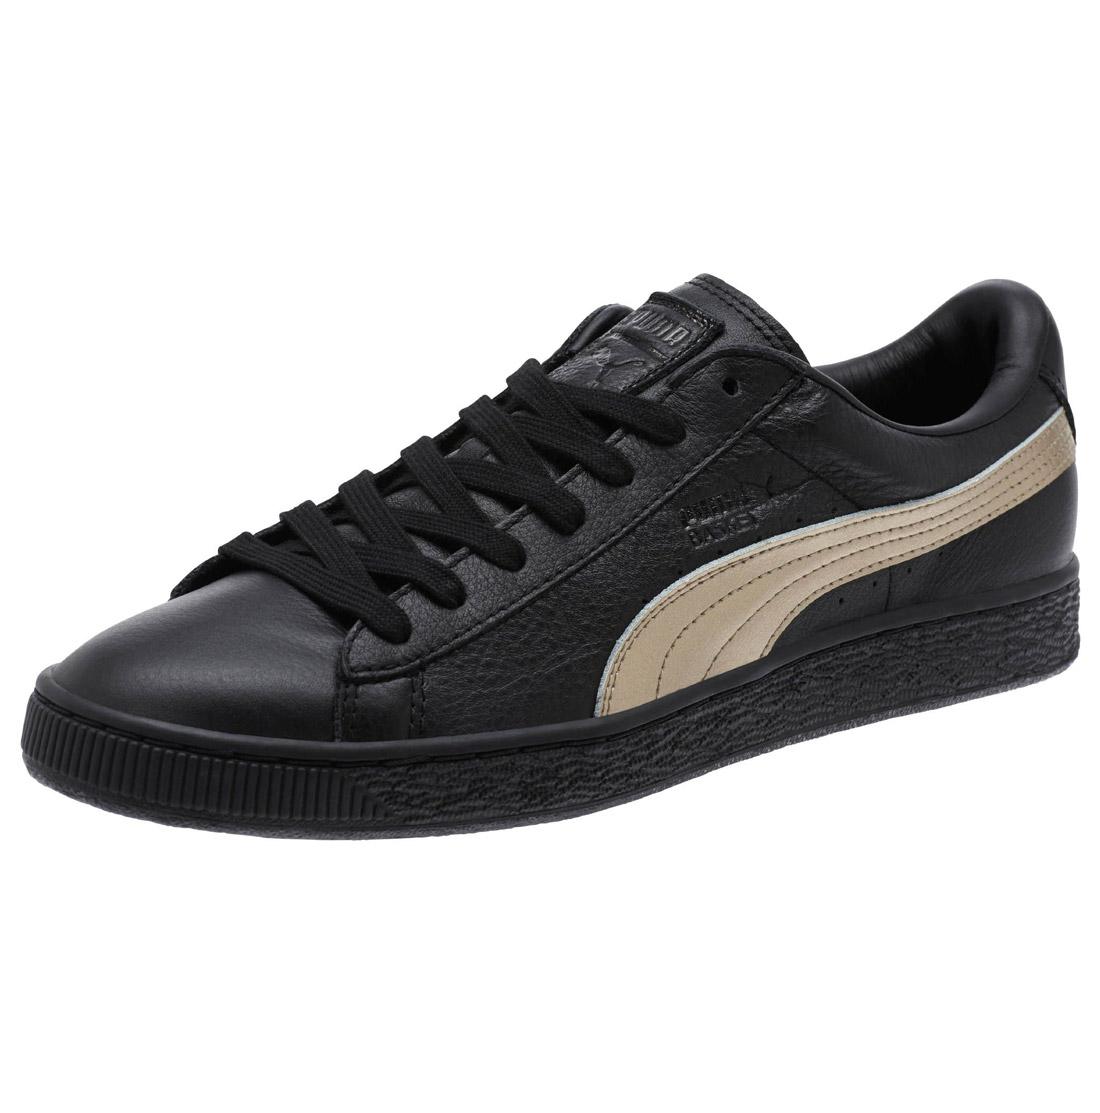 Puma Basket Classic Metallic SN Sneaker Damen Mädchen Schuhe